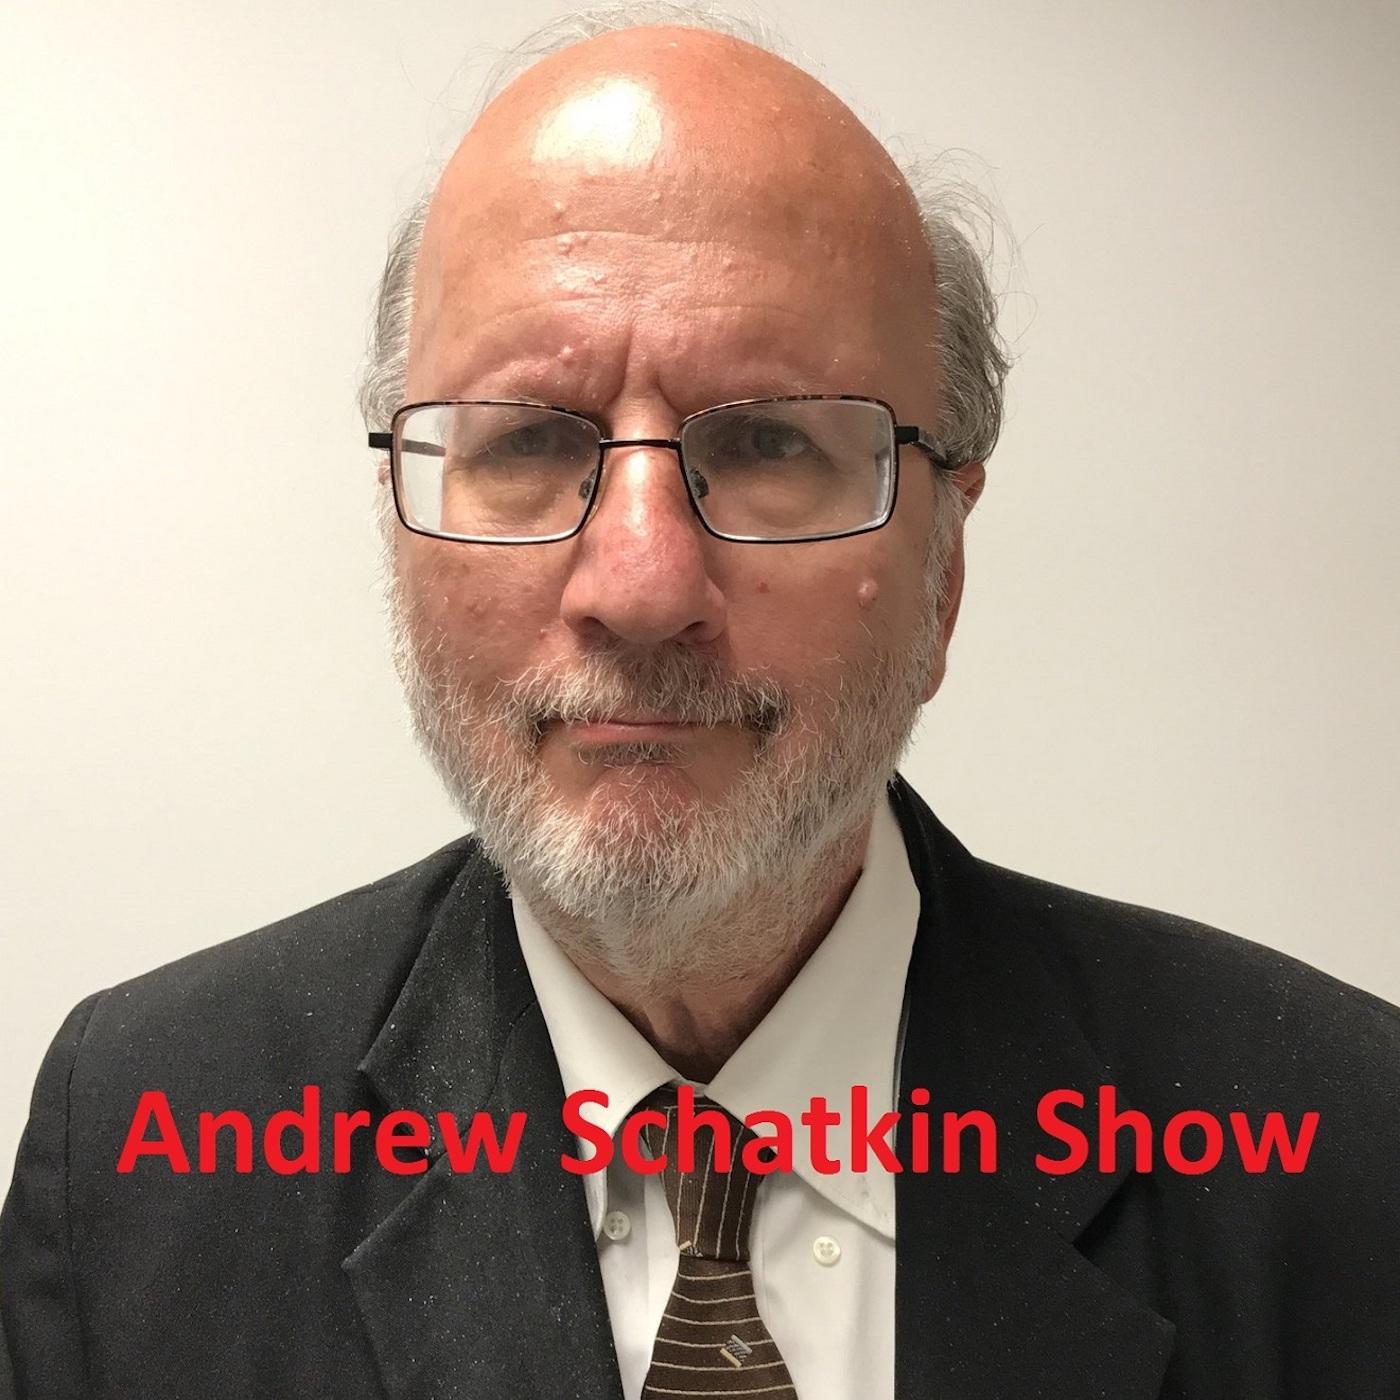 The Andrew Schatkin Show